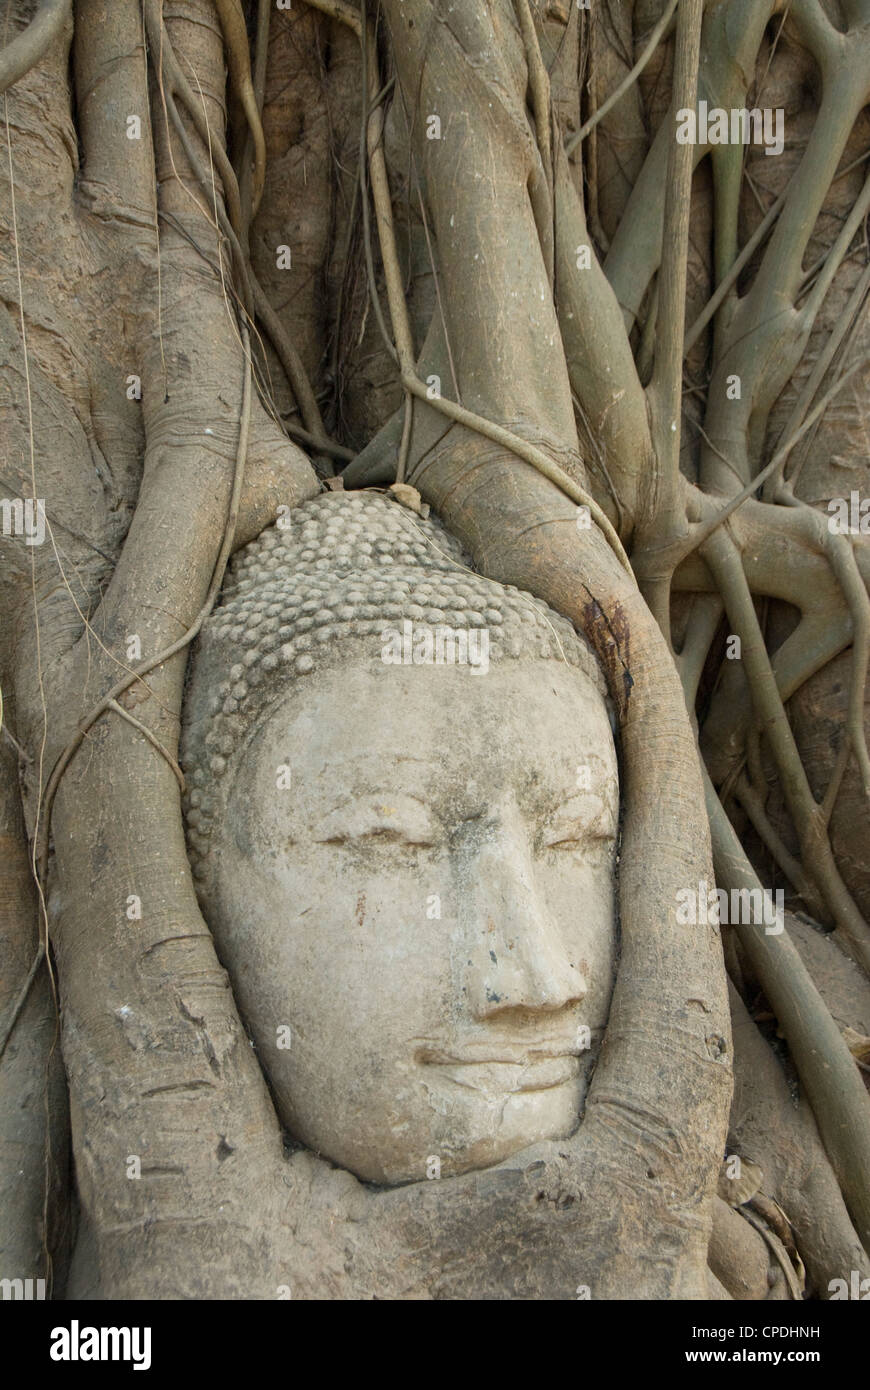 Buddha head, Wat Mahathat, Ayutthaya, UNESCO World Heritage Site, Thailand, Southeast Asia, Asia Stock Photo